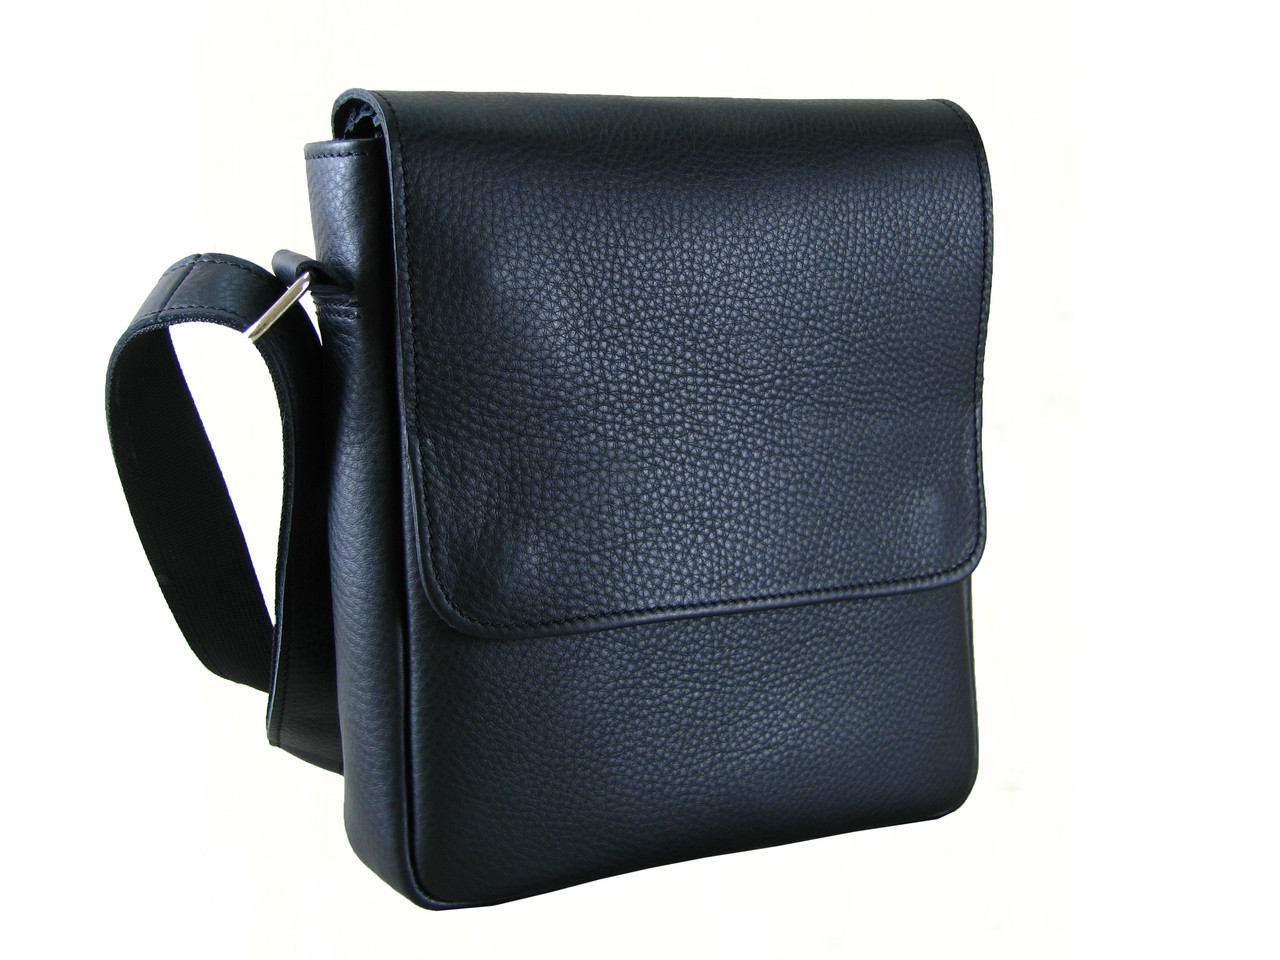 Мужская сумка барсетка GS черная